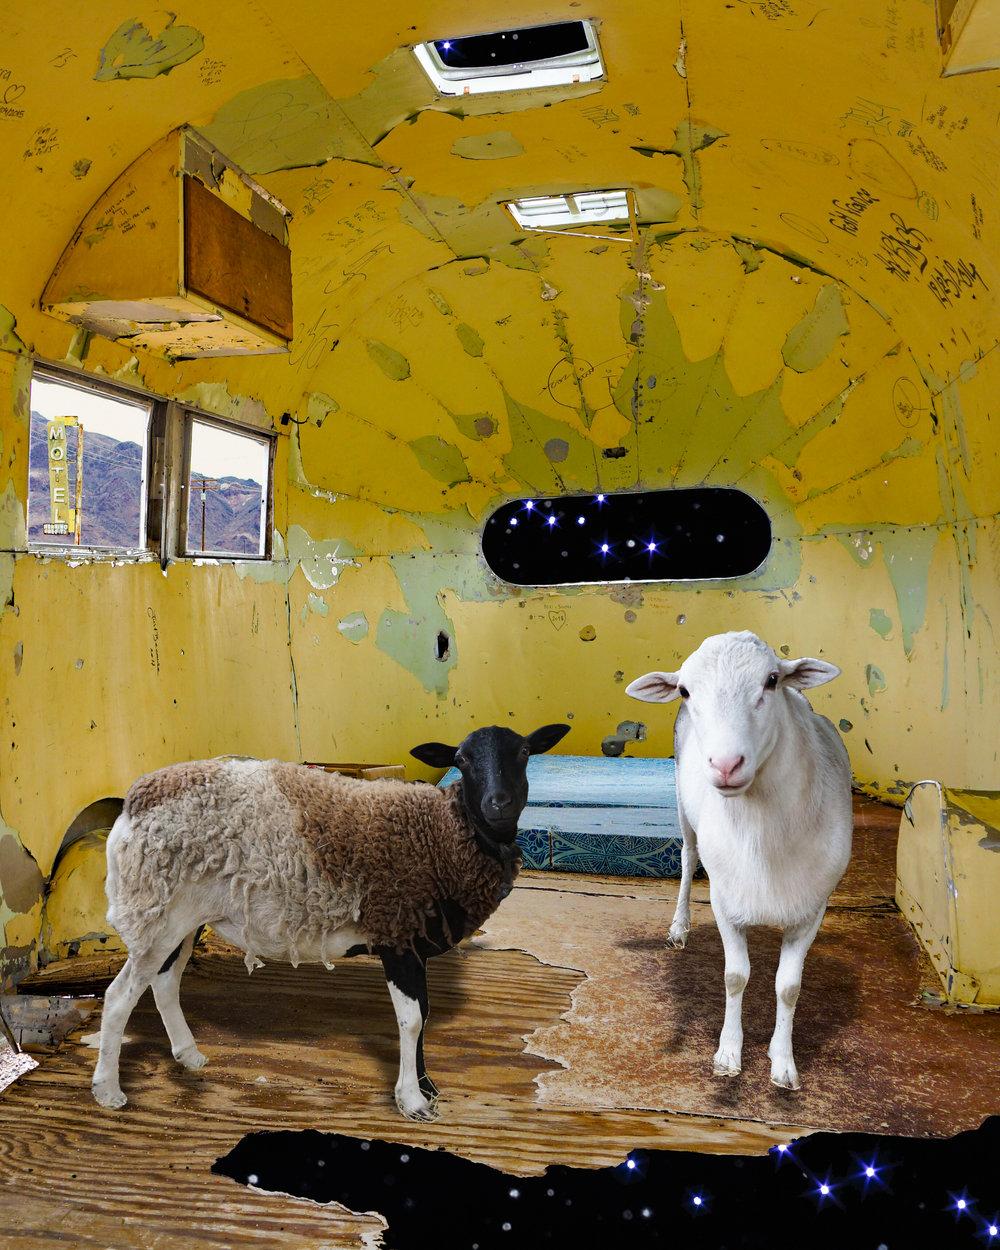 Sheep's Ship